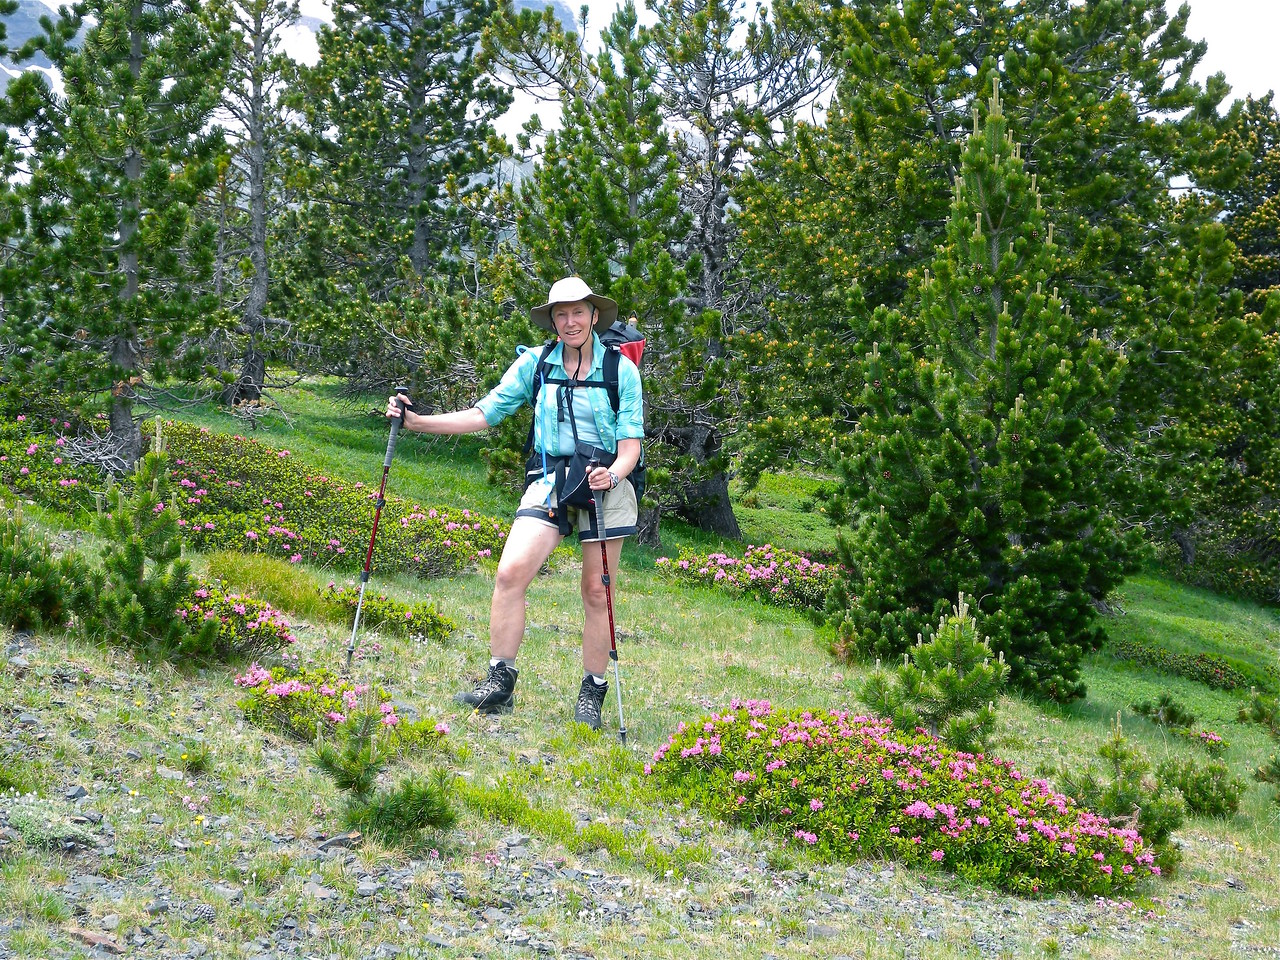 Di, Pines, Alpenrose